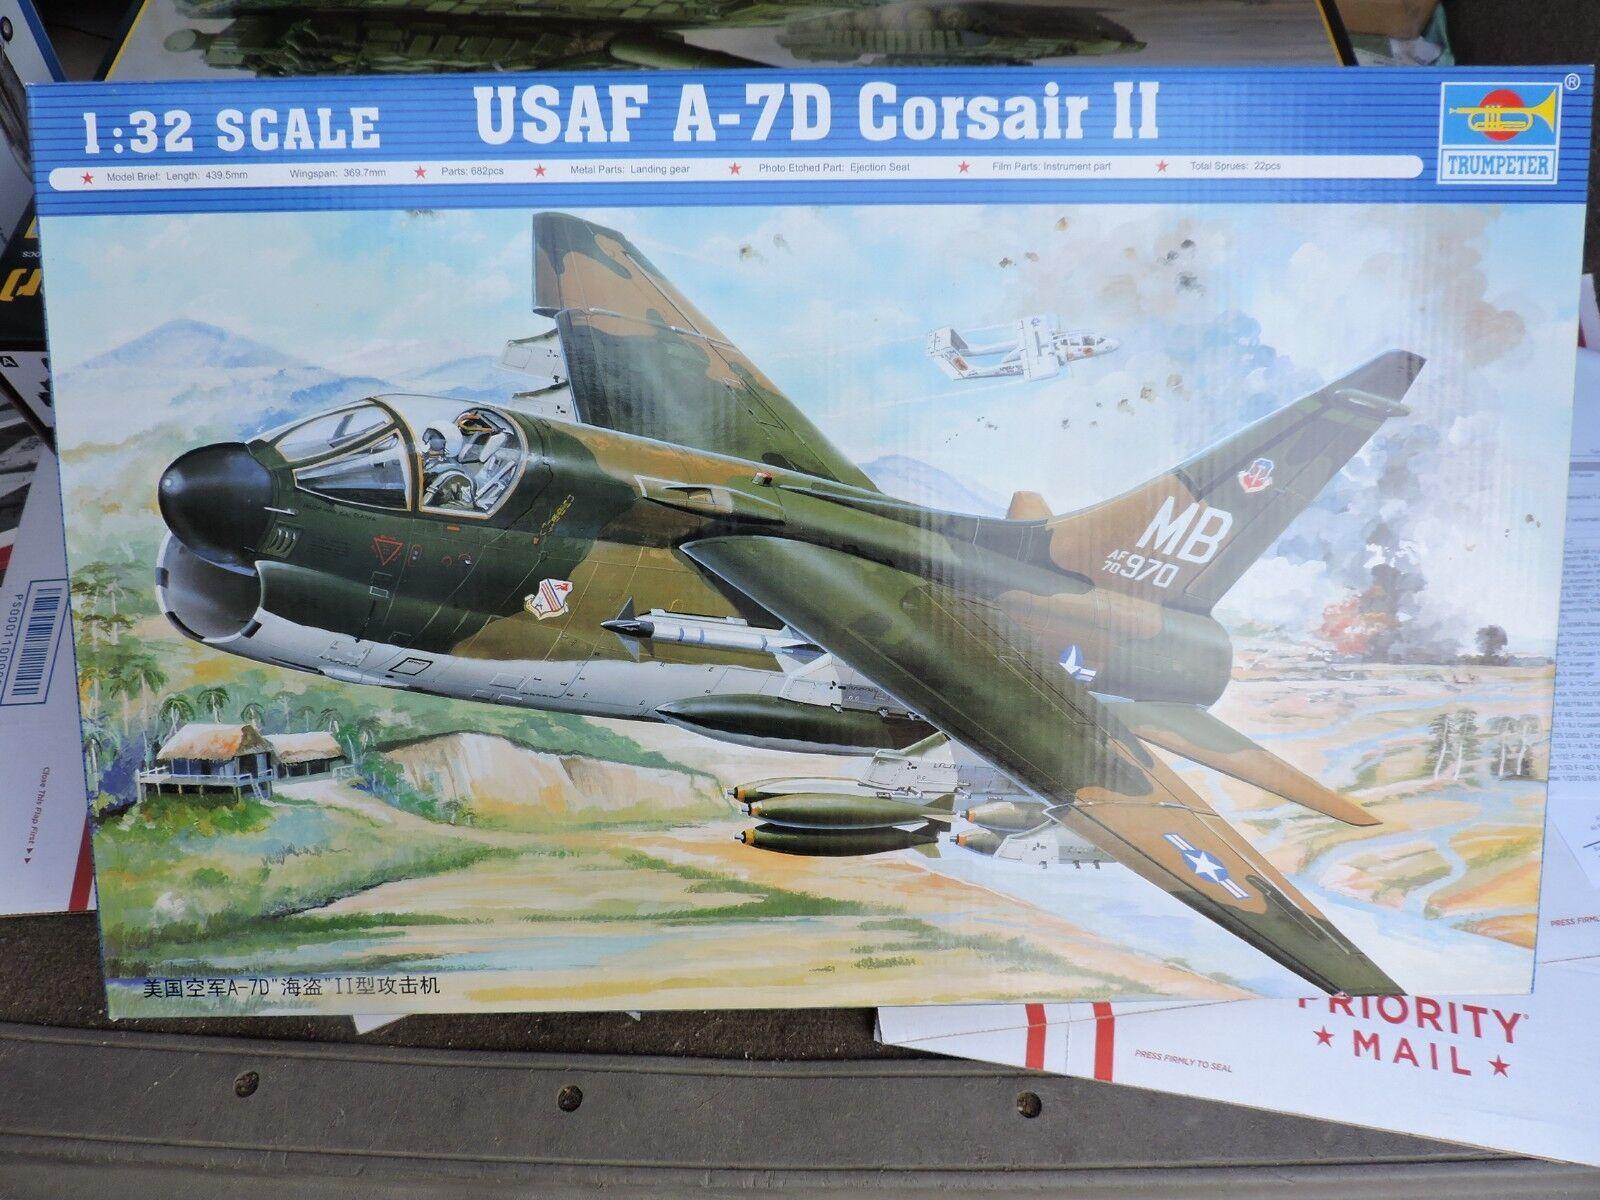 02245 1 32 escala USAF A-7D Corsair II avión Fighter Warplane Trumpeter